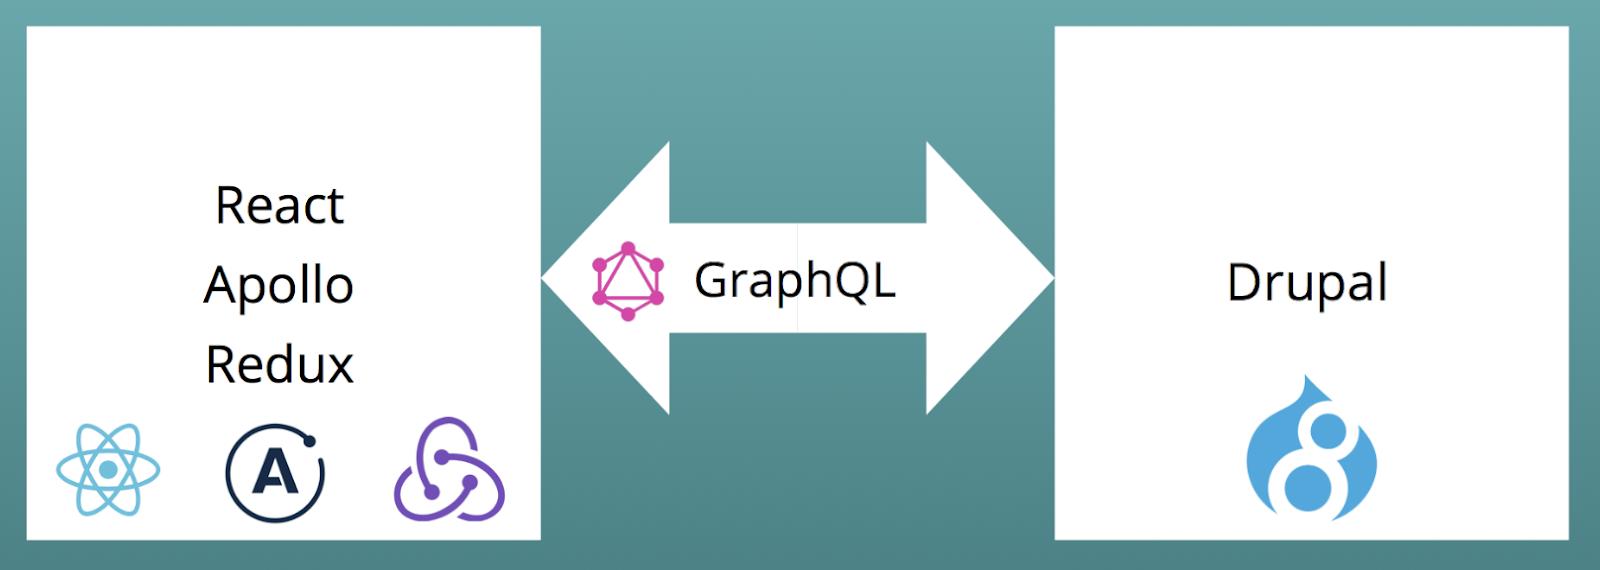 Salsa Digital: DrupalCon Baltimore: Drupal, React and GraphQL